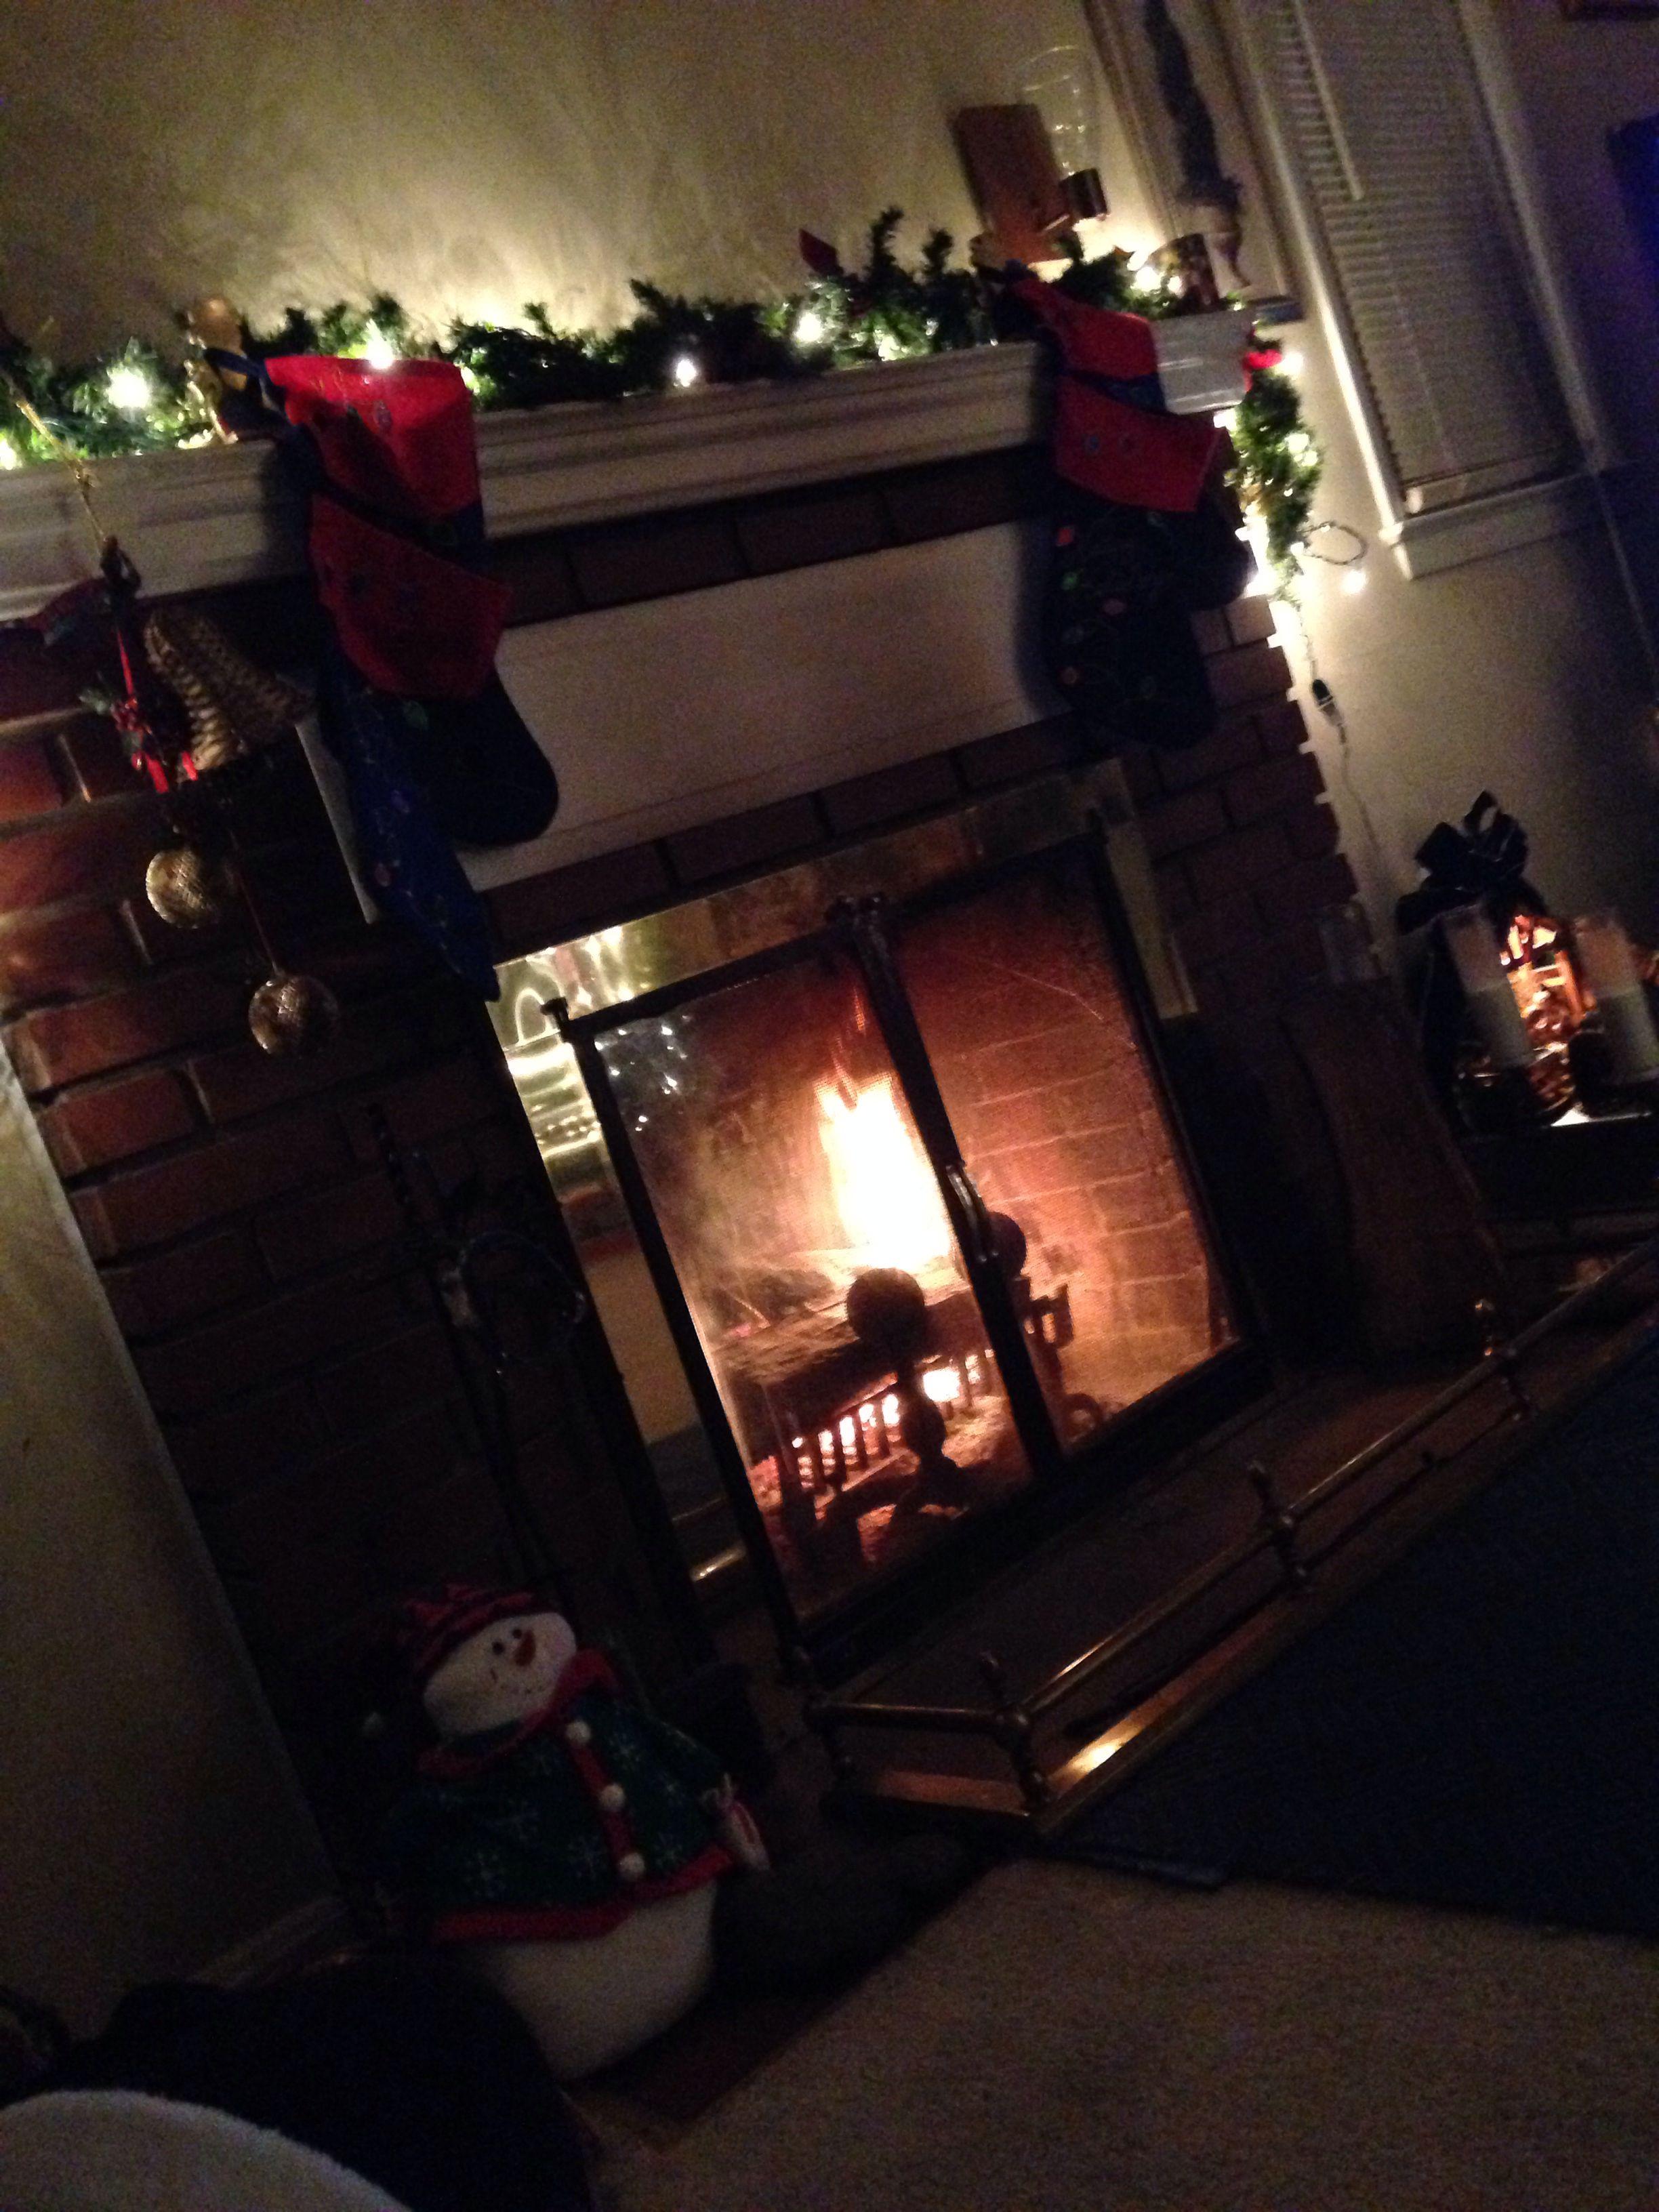 Chimney | All things christmas, Decor, Home decor